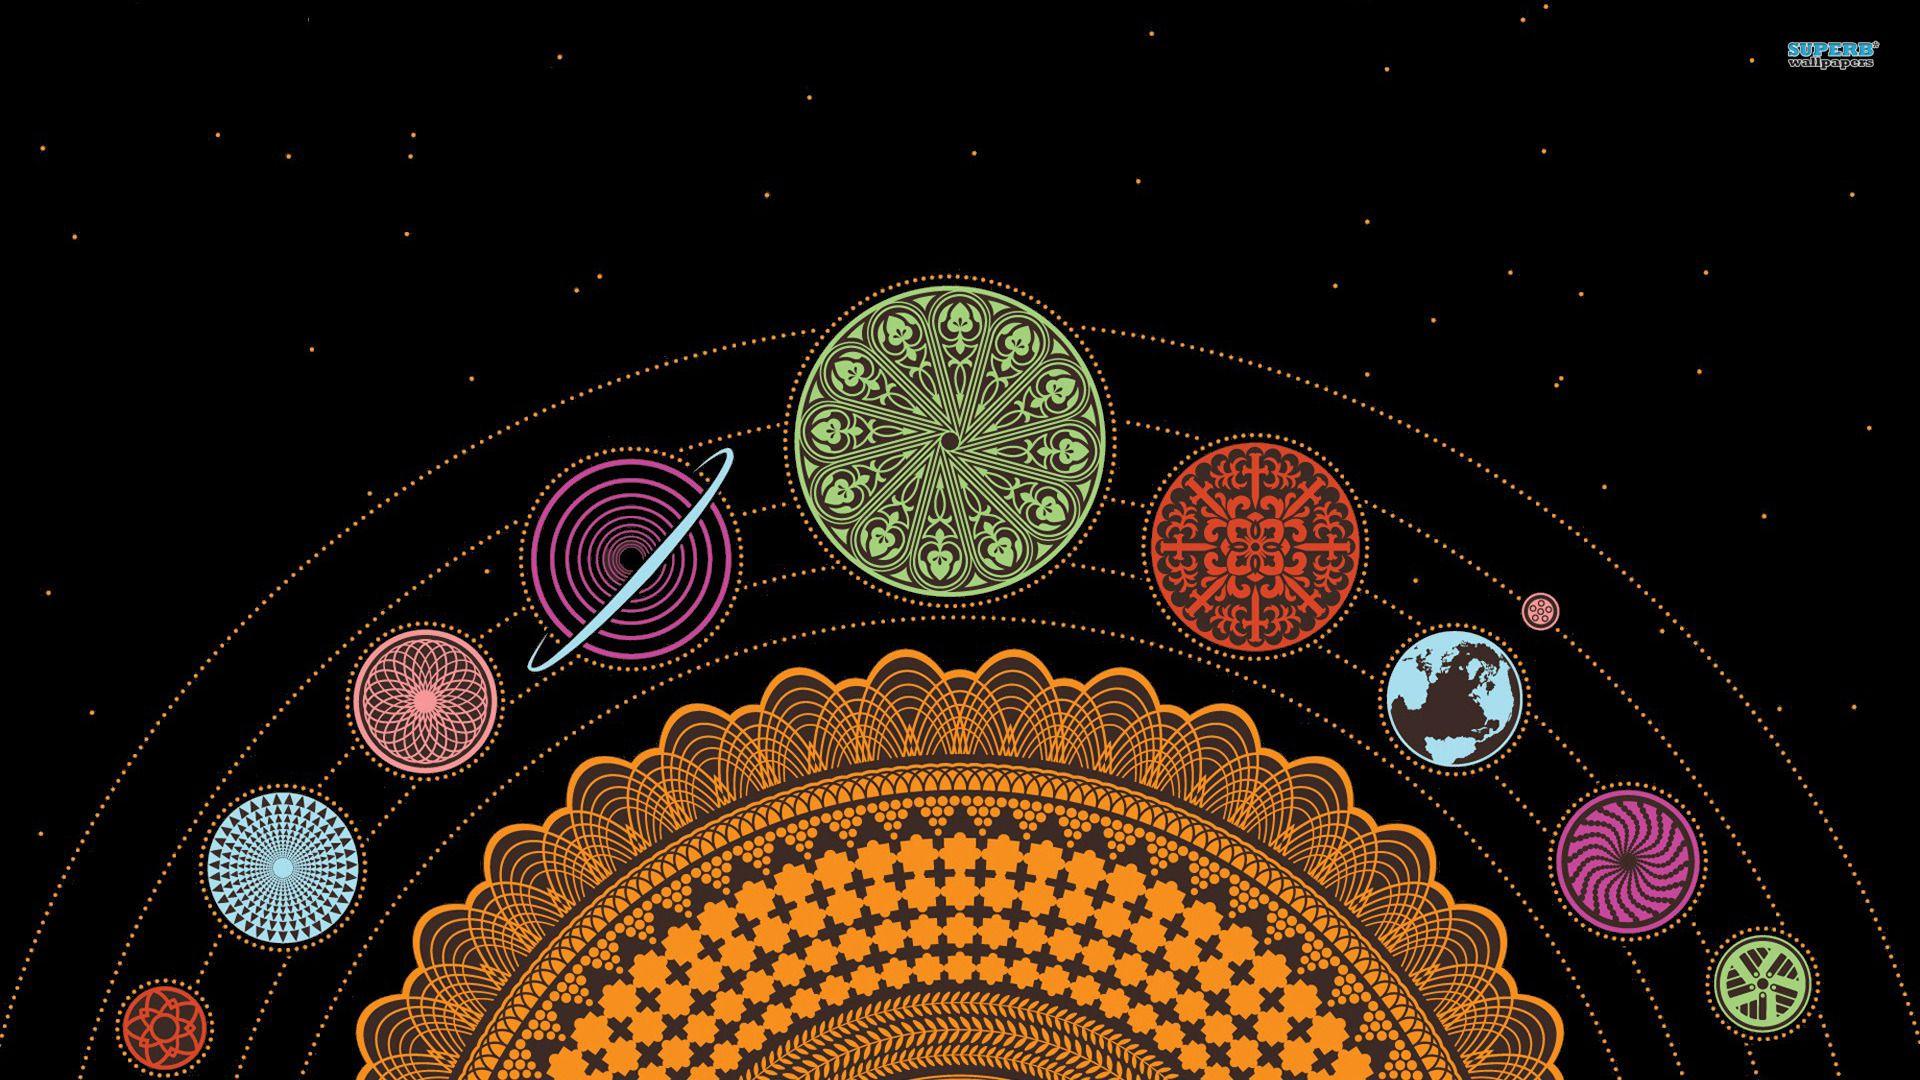 Spiral Solar System Wallpaper Wide Hd Wallpaper Site Solar